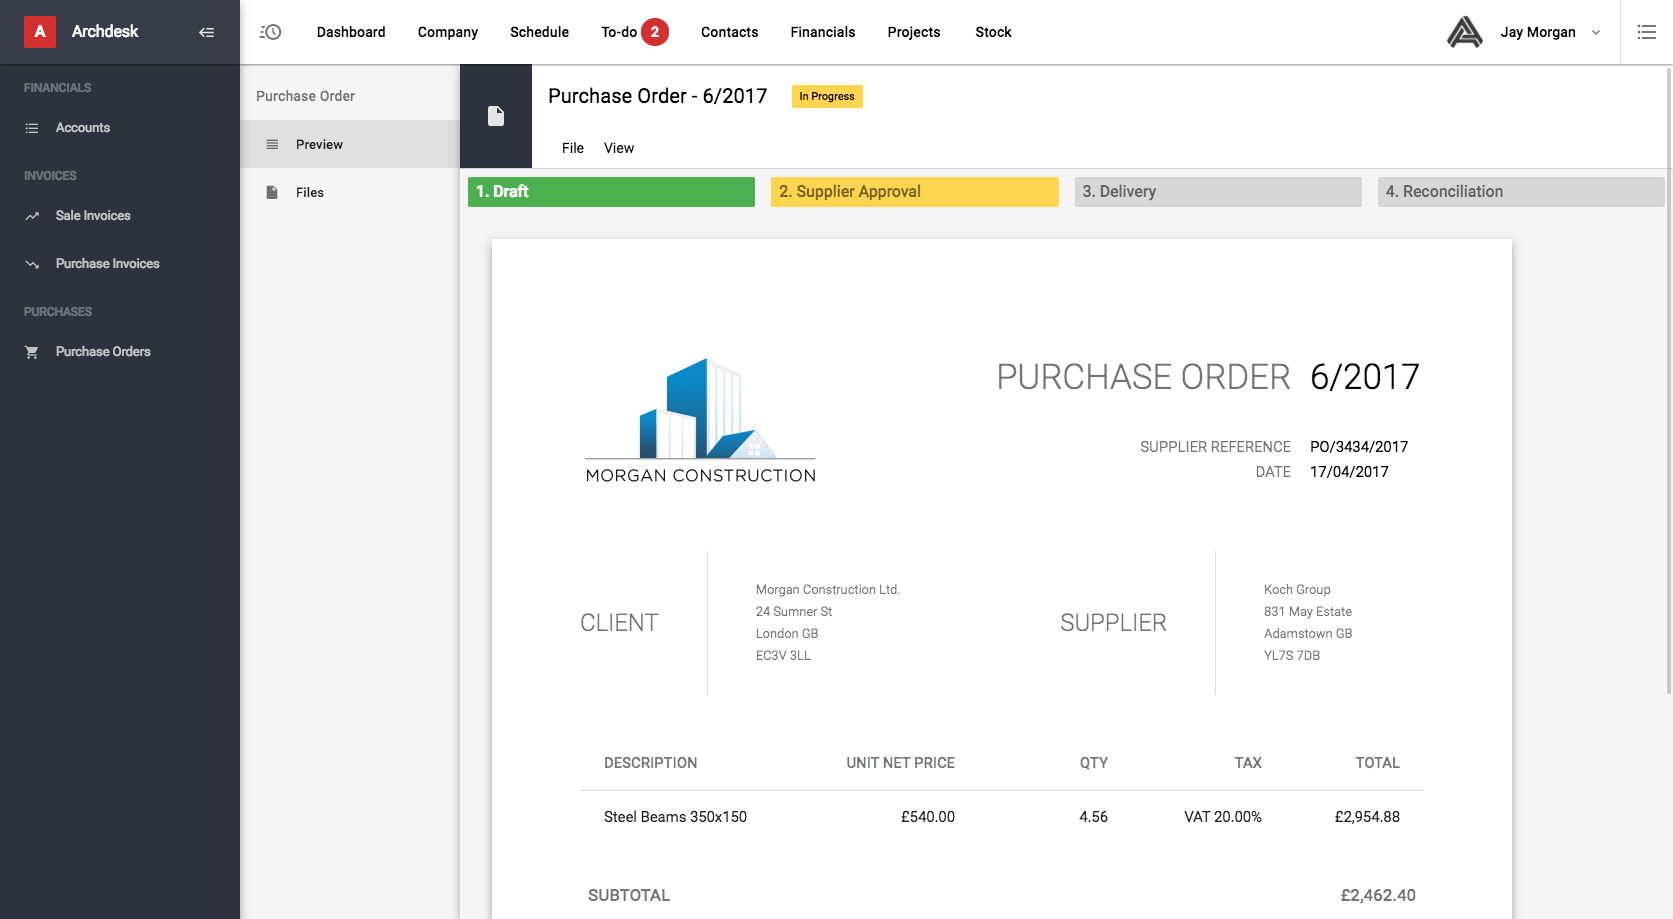 Archdesk purchase orders screenshot